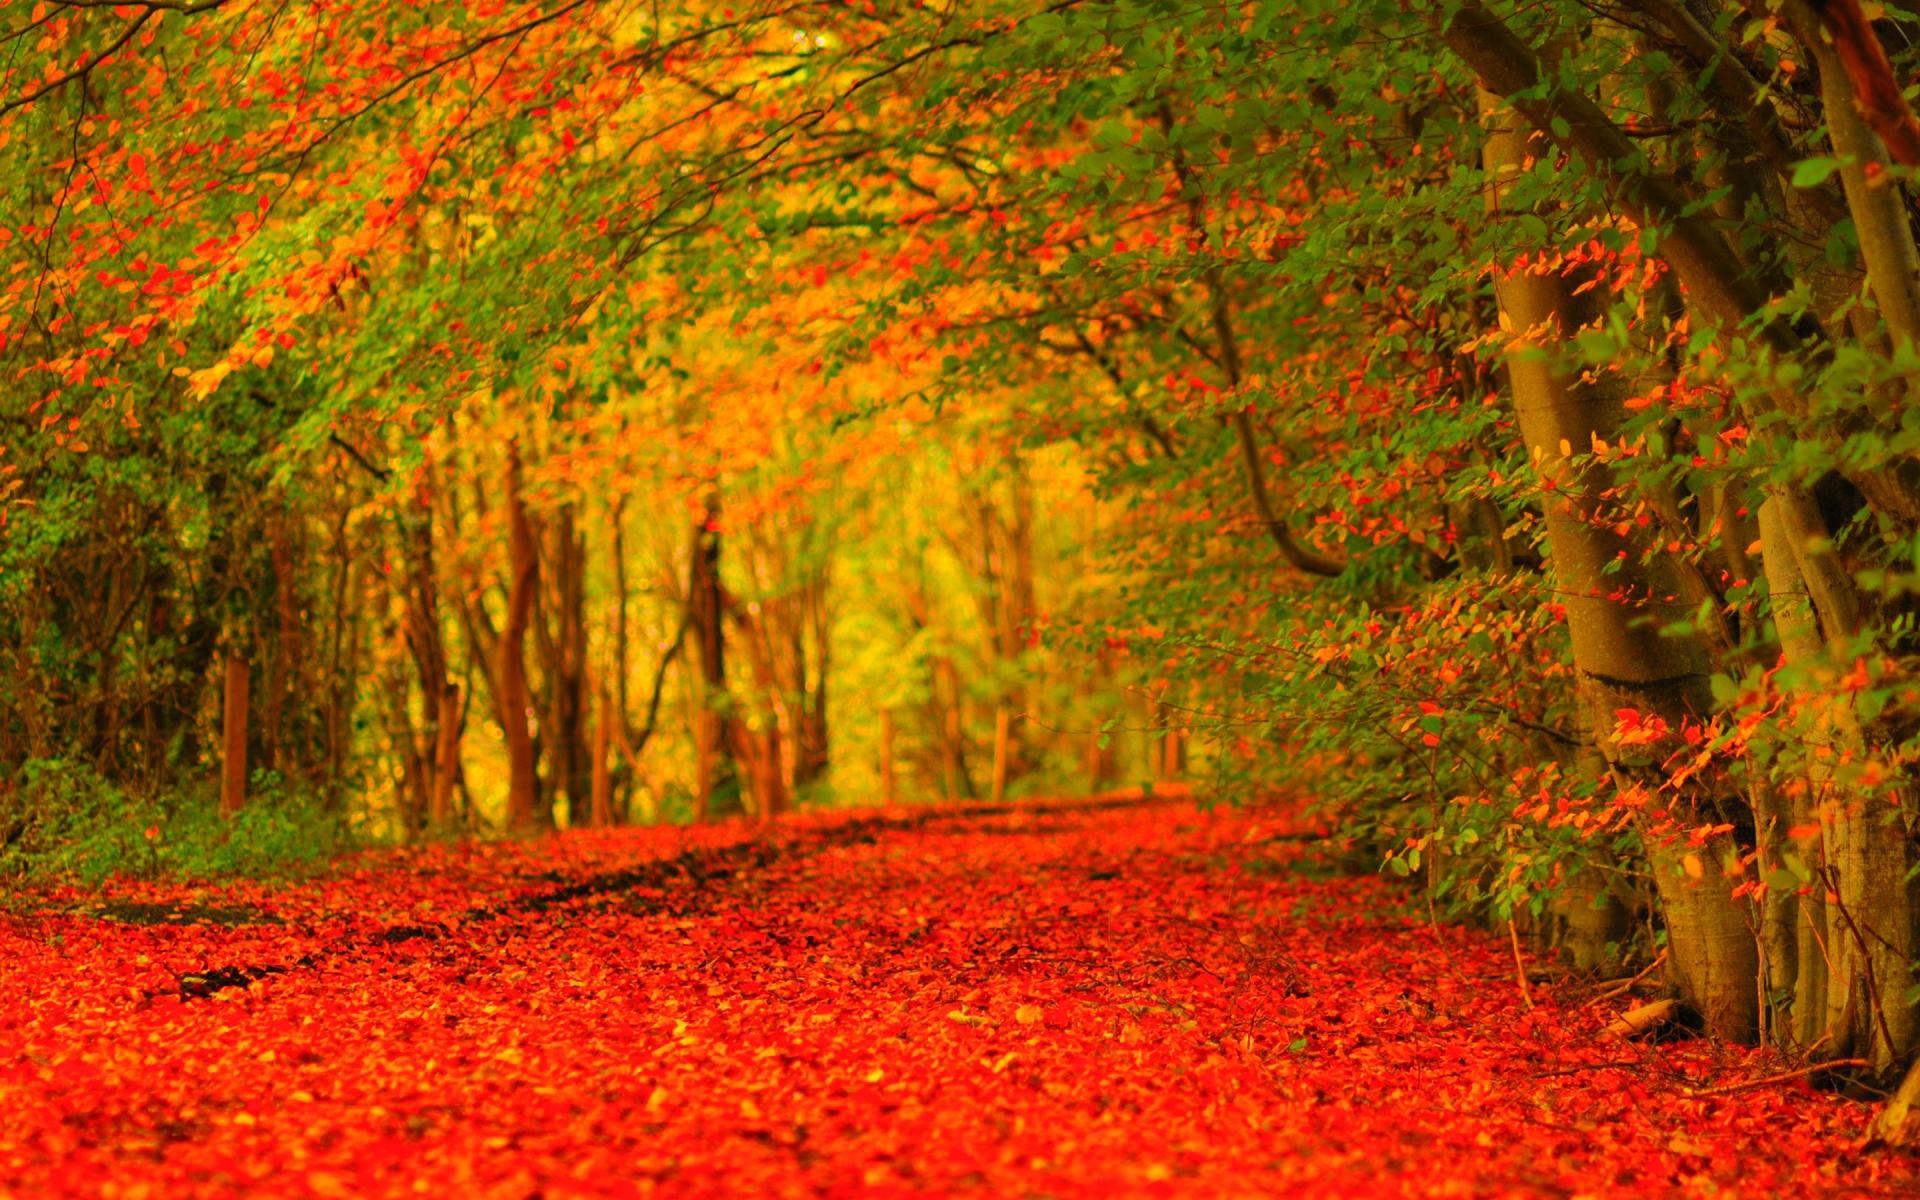 Beautiful Autumn HD Wallpapers 1920x1080 - WallpaperSafari